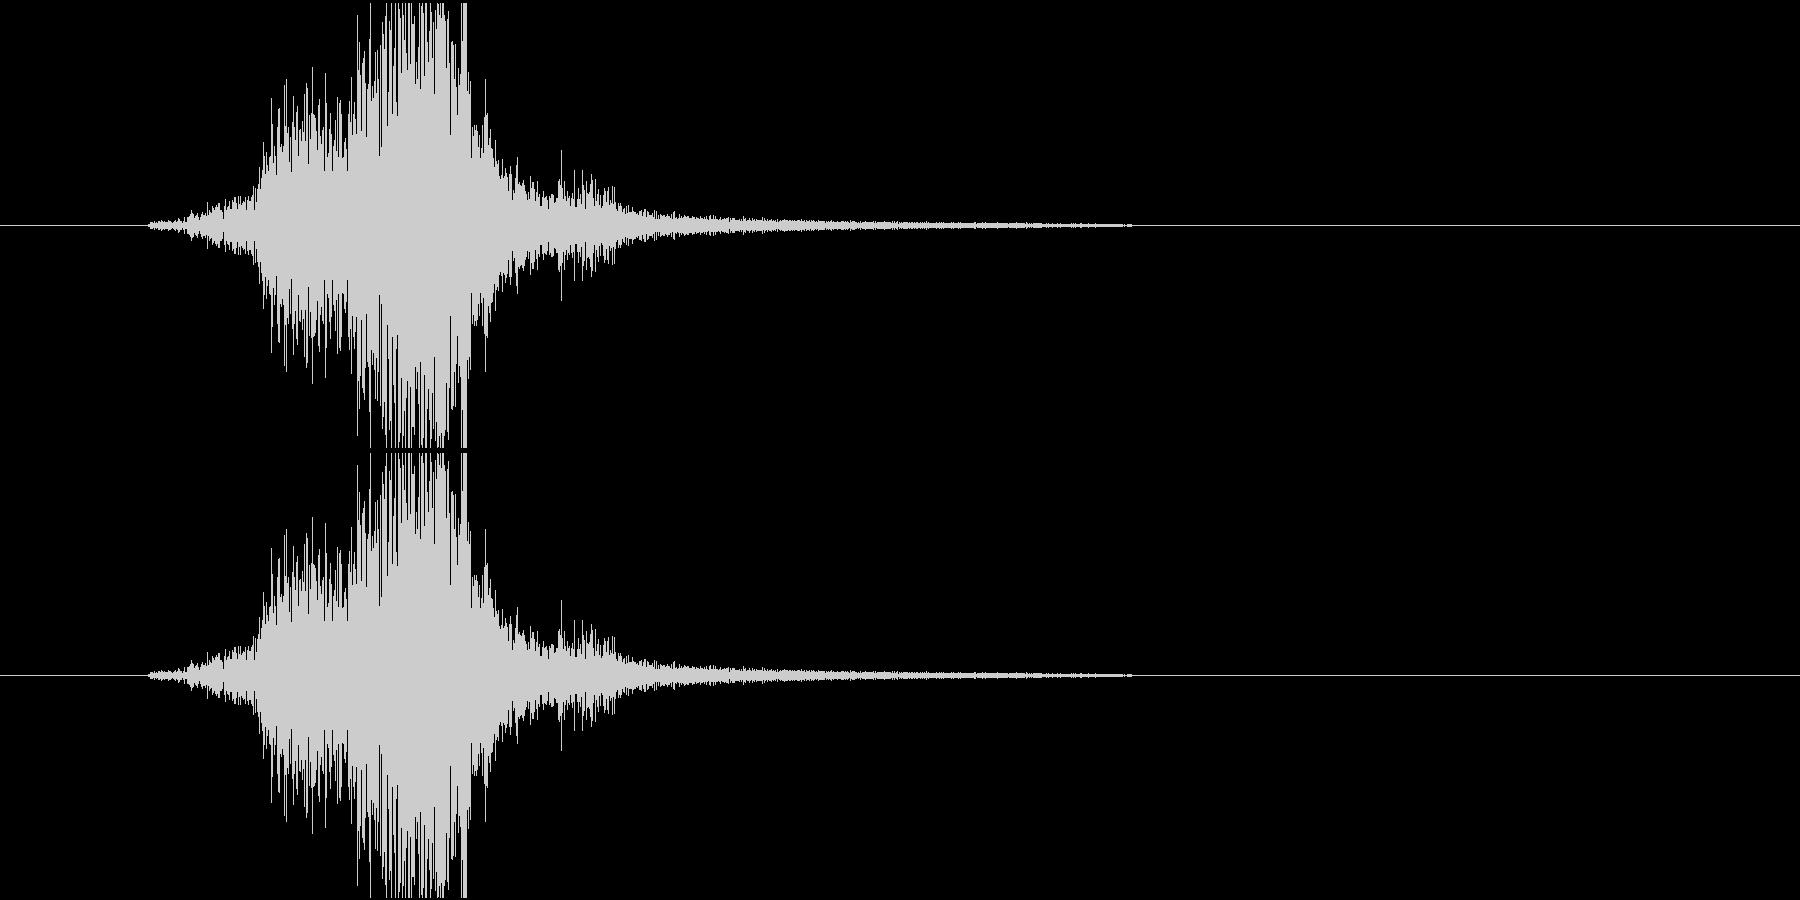 Katana 日本刀を鞘から抜く音 の未再生の波形